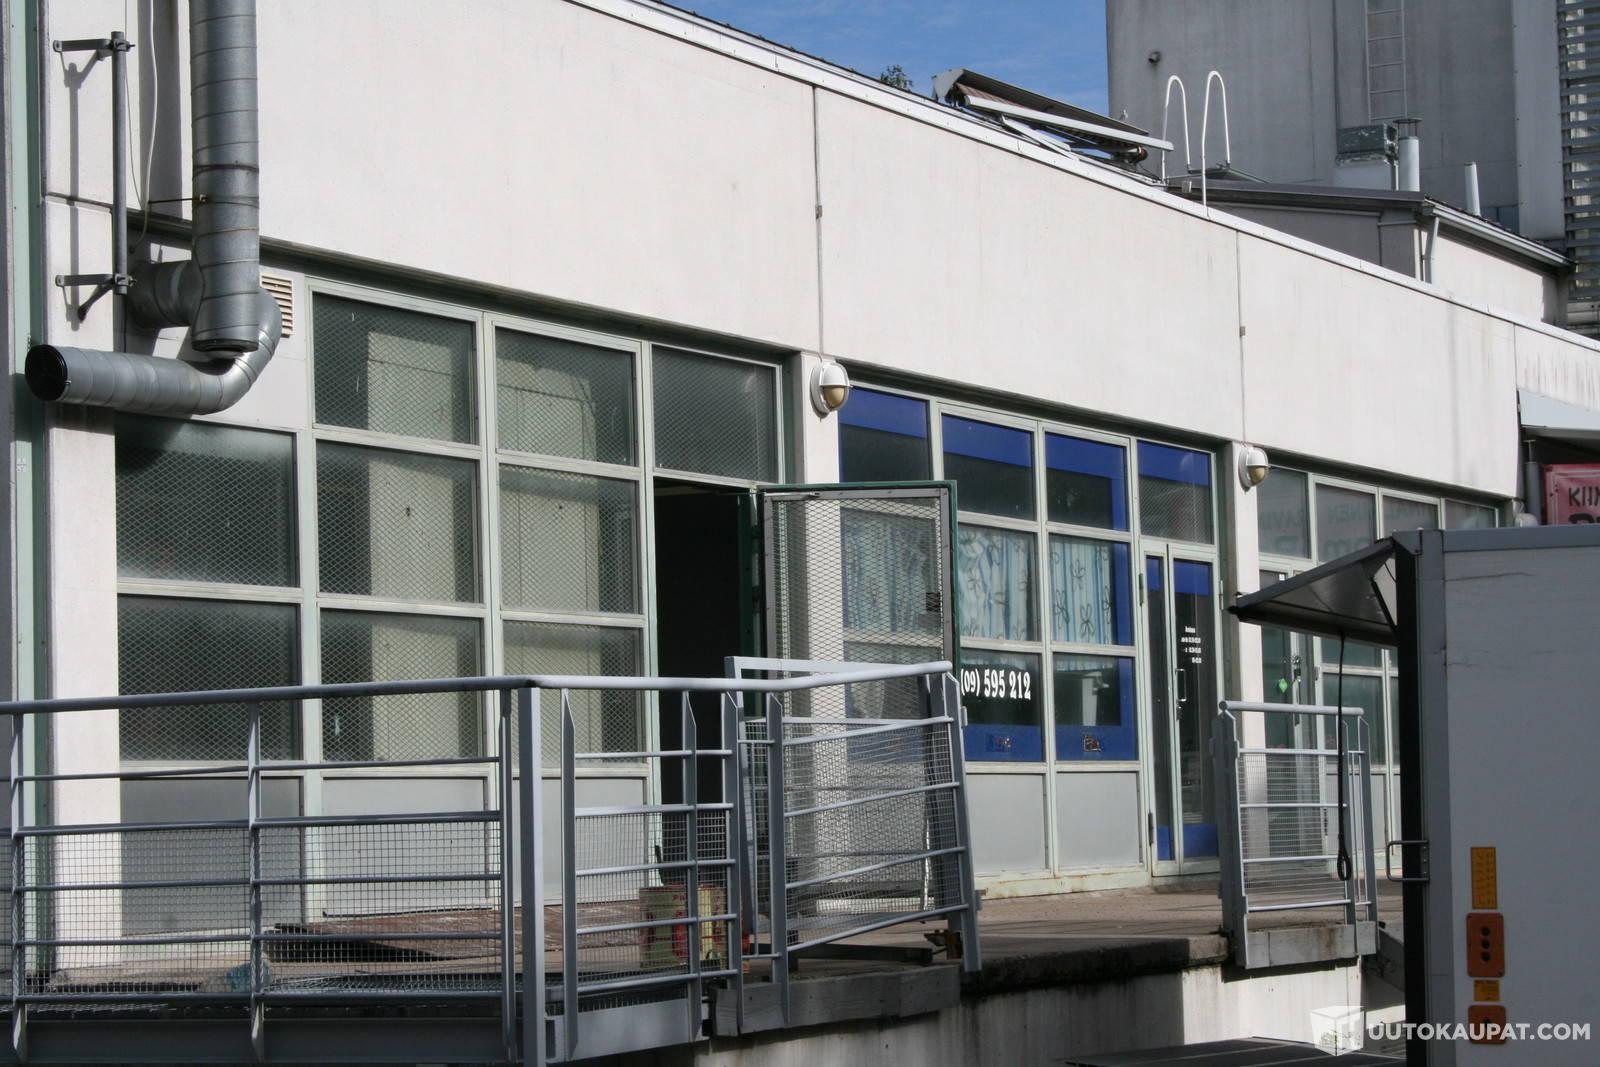 Toimitila, Kavallinpelto 13, viherlaakso, Espoo